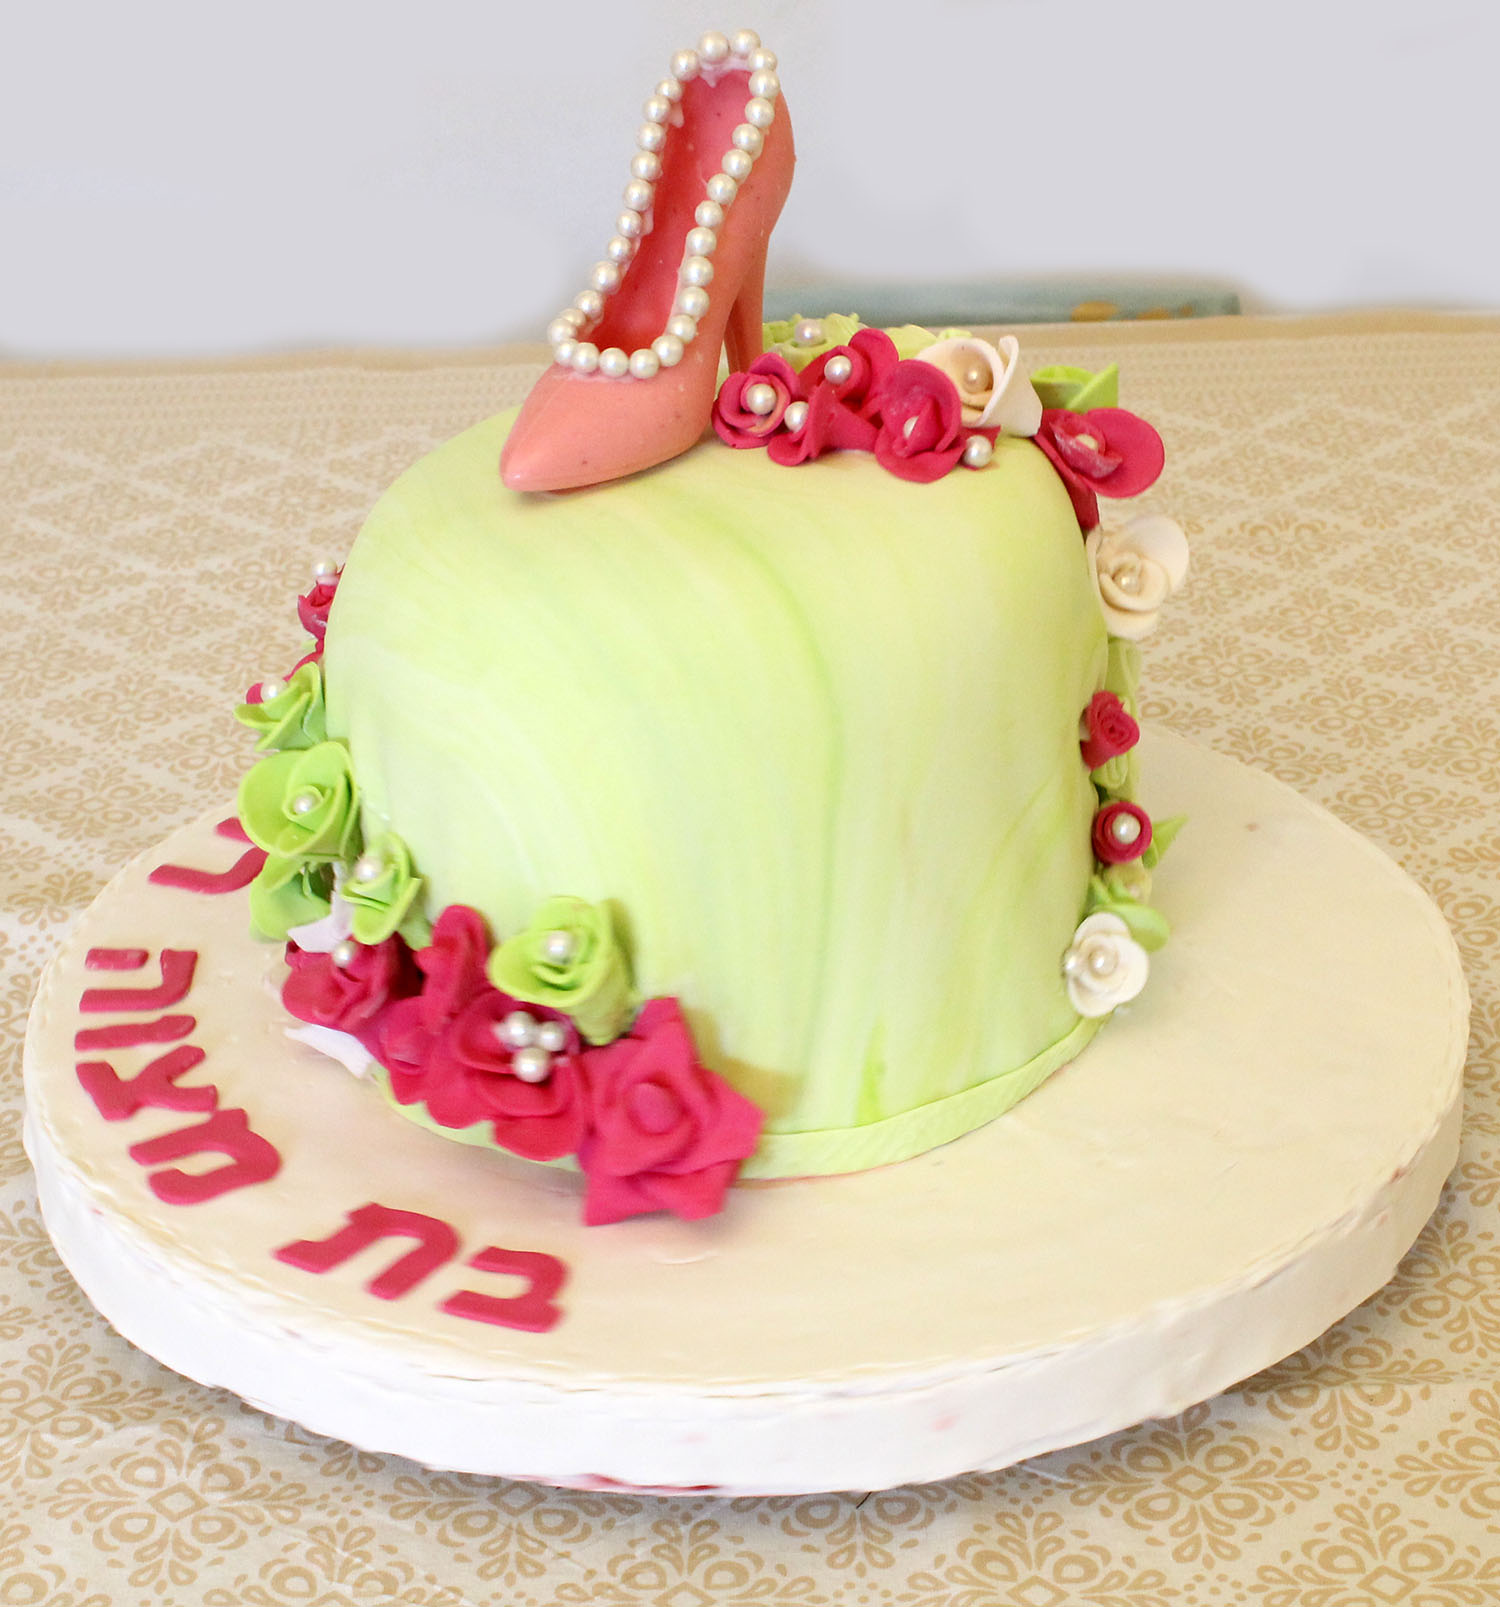 IMG 6325 - עוגה לבת מצוה